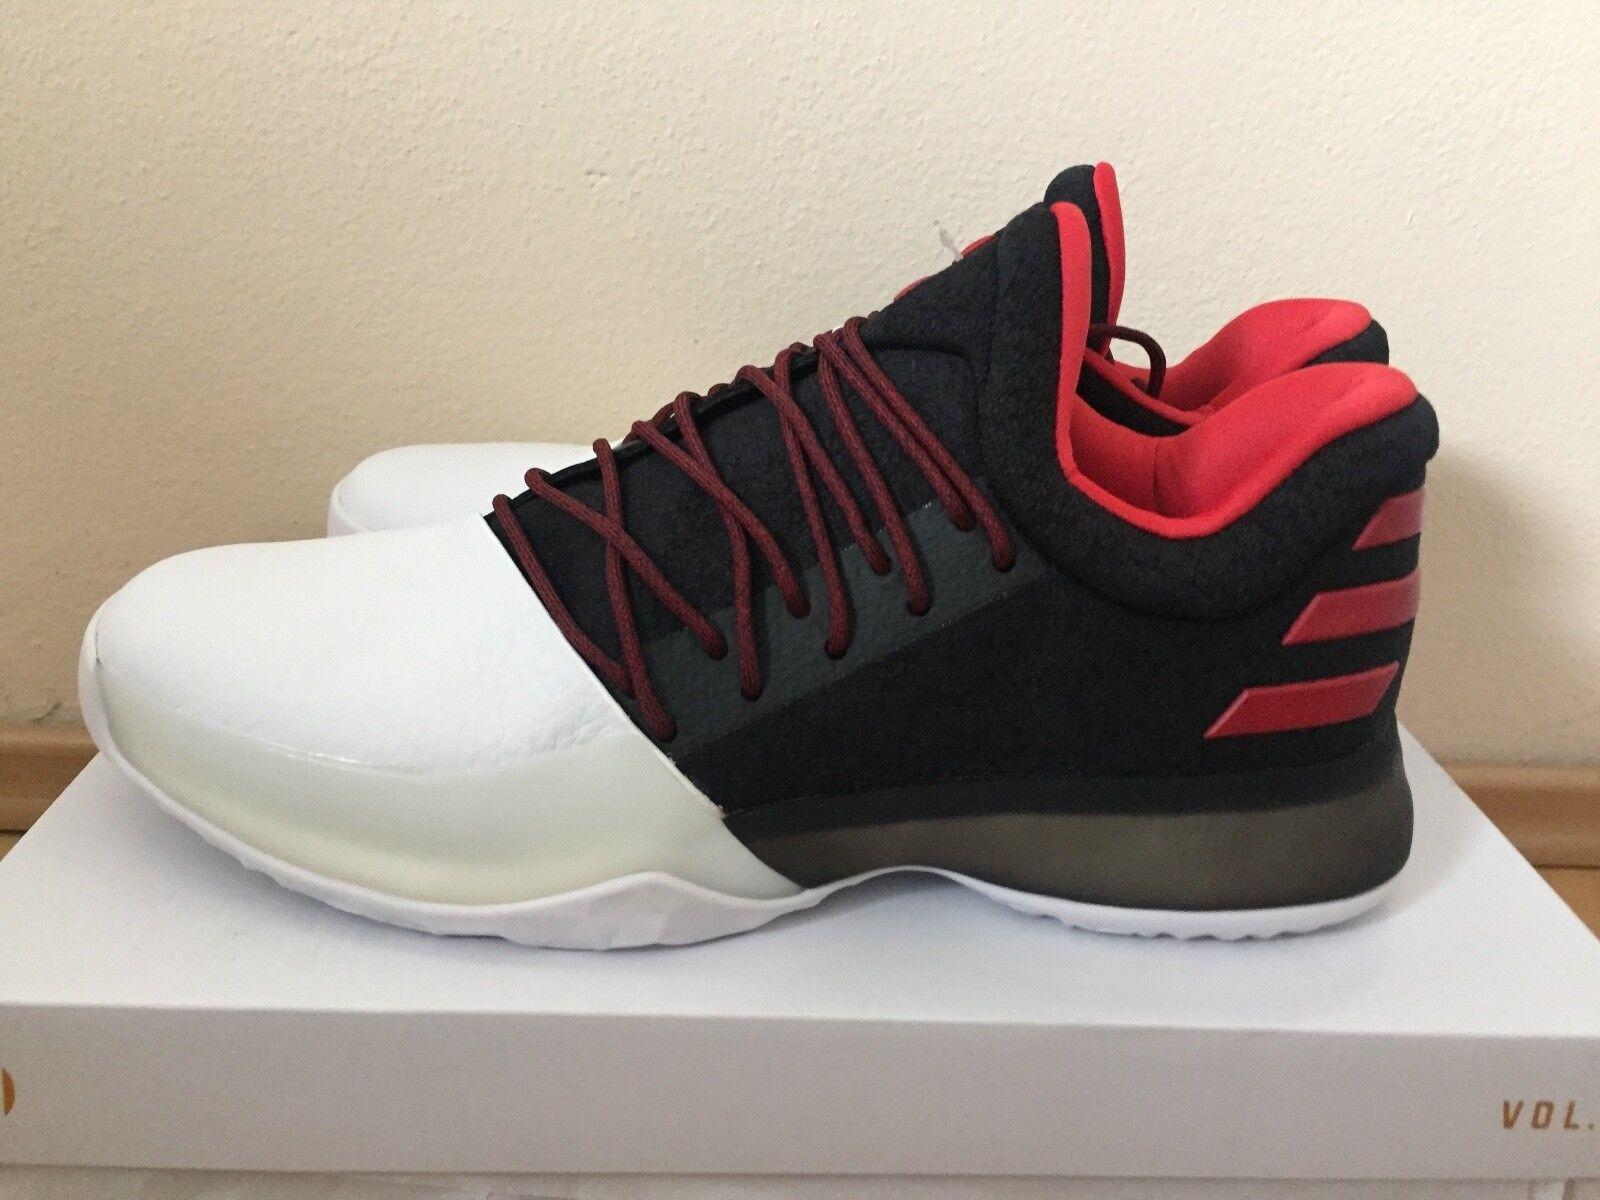 Adidas Harden Vol.1 BW0546 Negro blancoo Performance luz escarlata Baloncesto Zapato